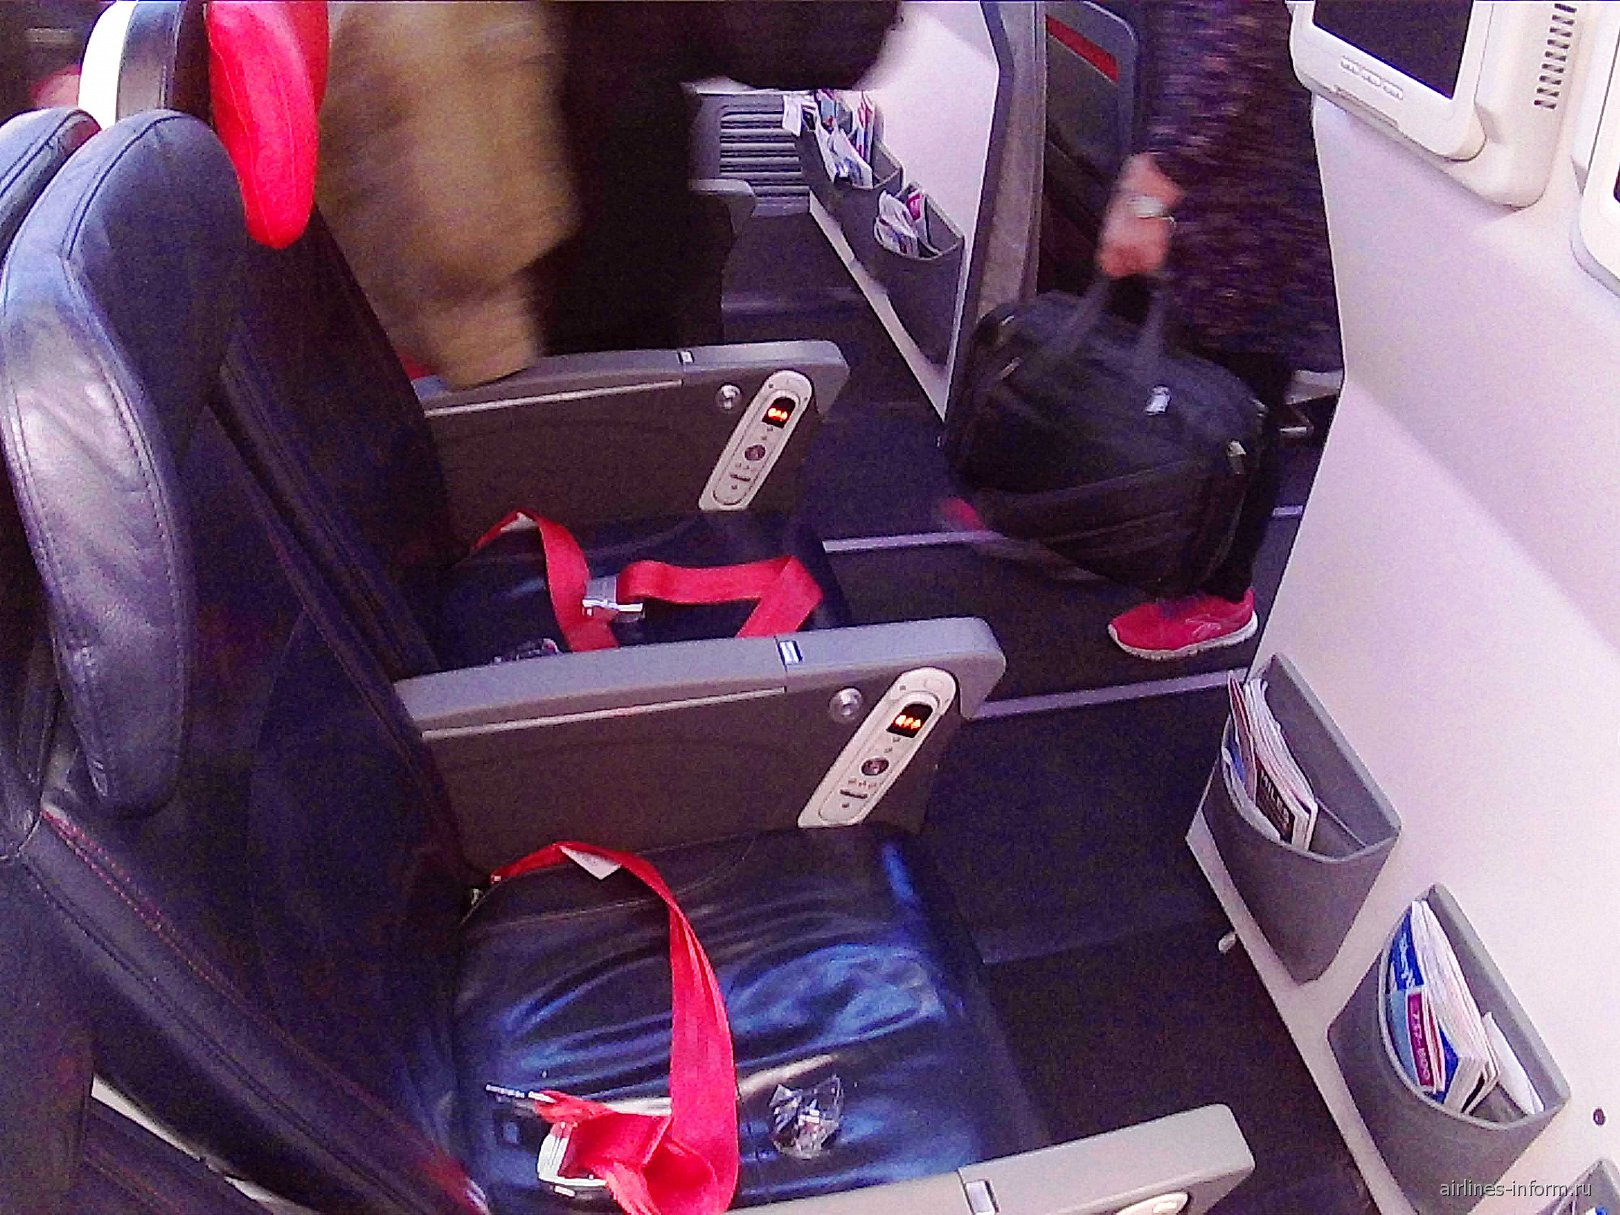 Кресла самолета Боинг-737-800 Турецких авиалиний